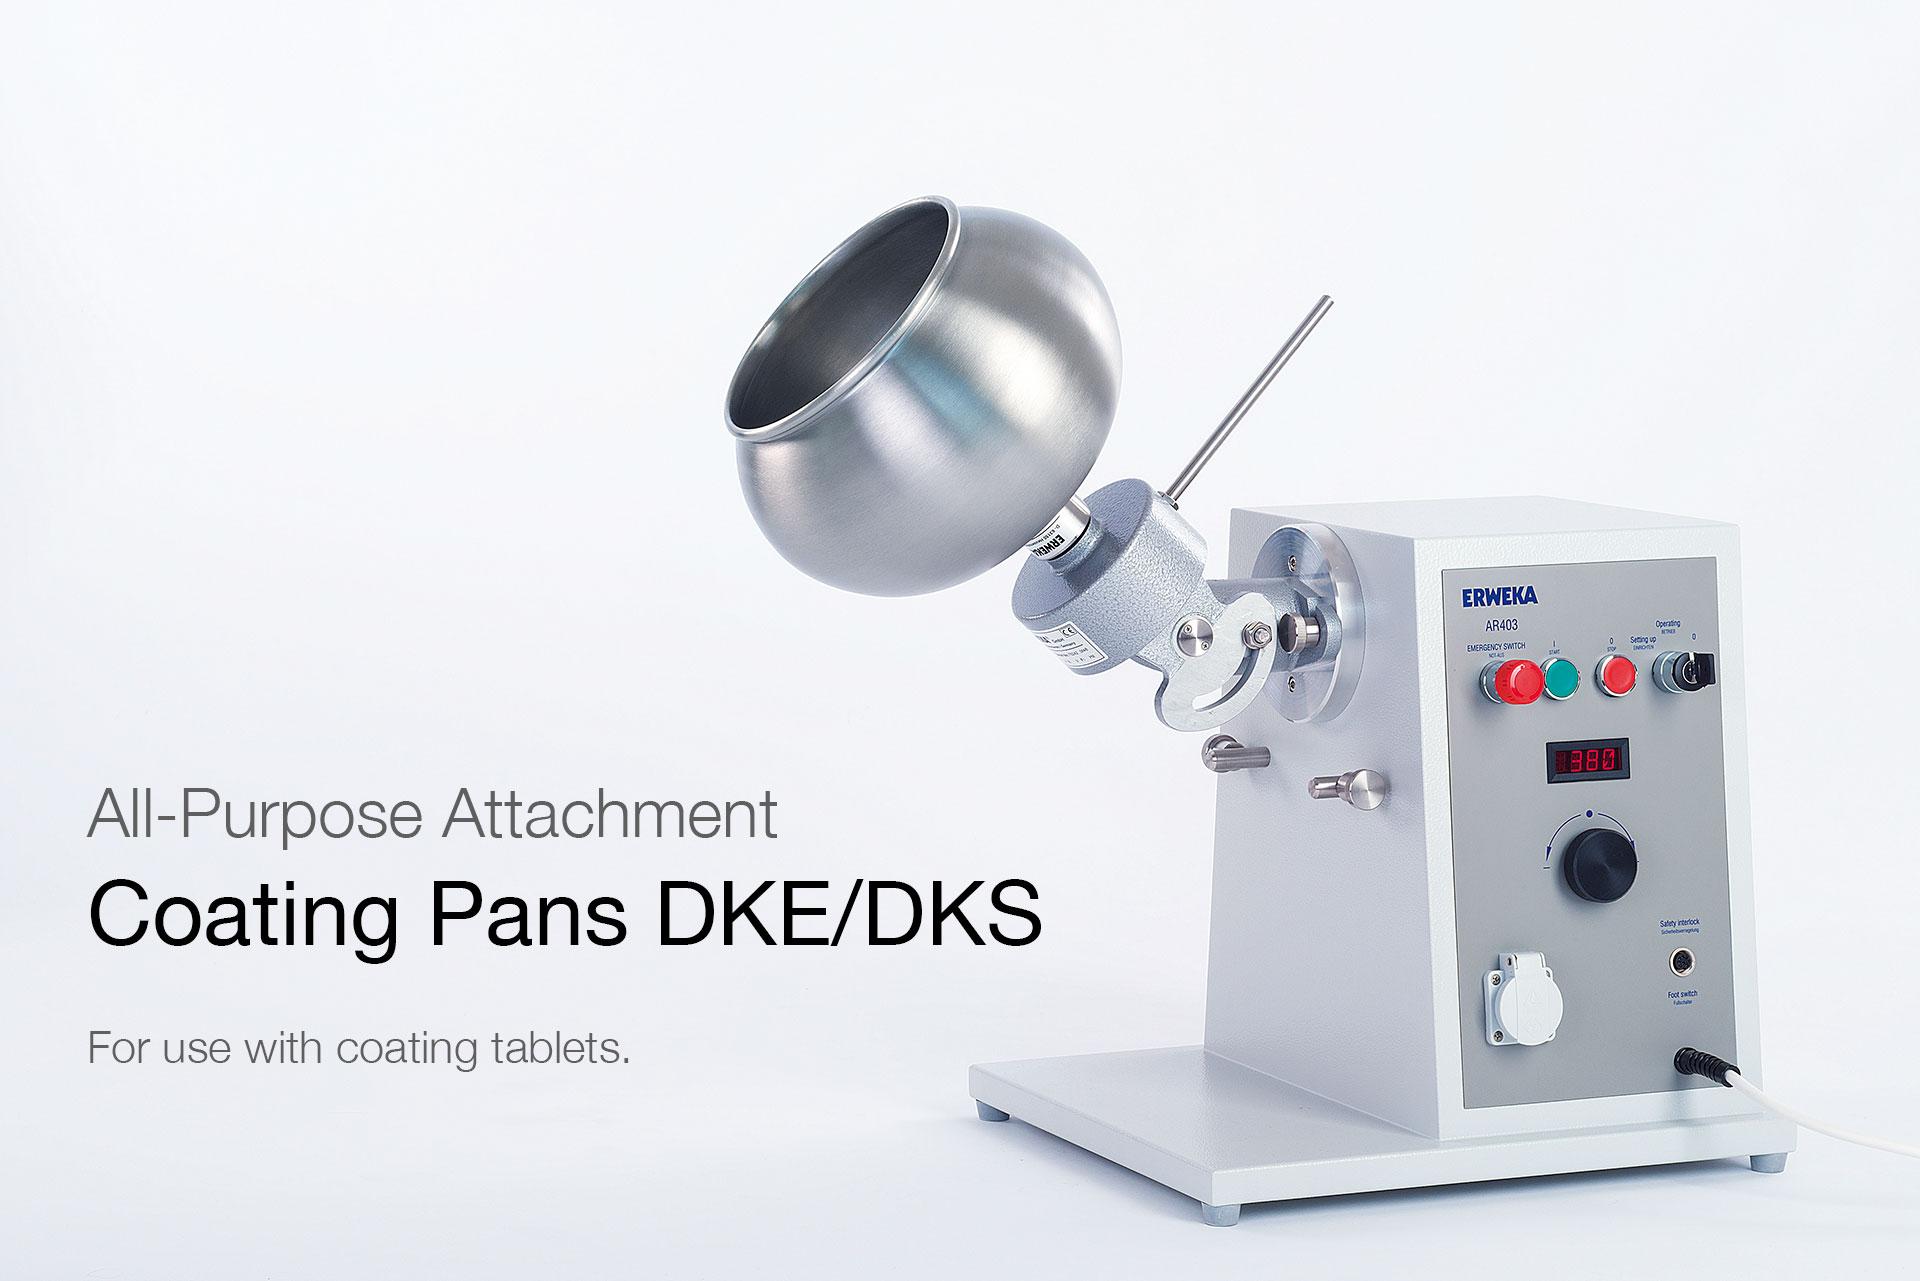 R D Coatings Coating Pans DKE/DKS -...